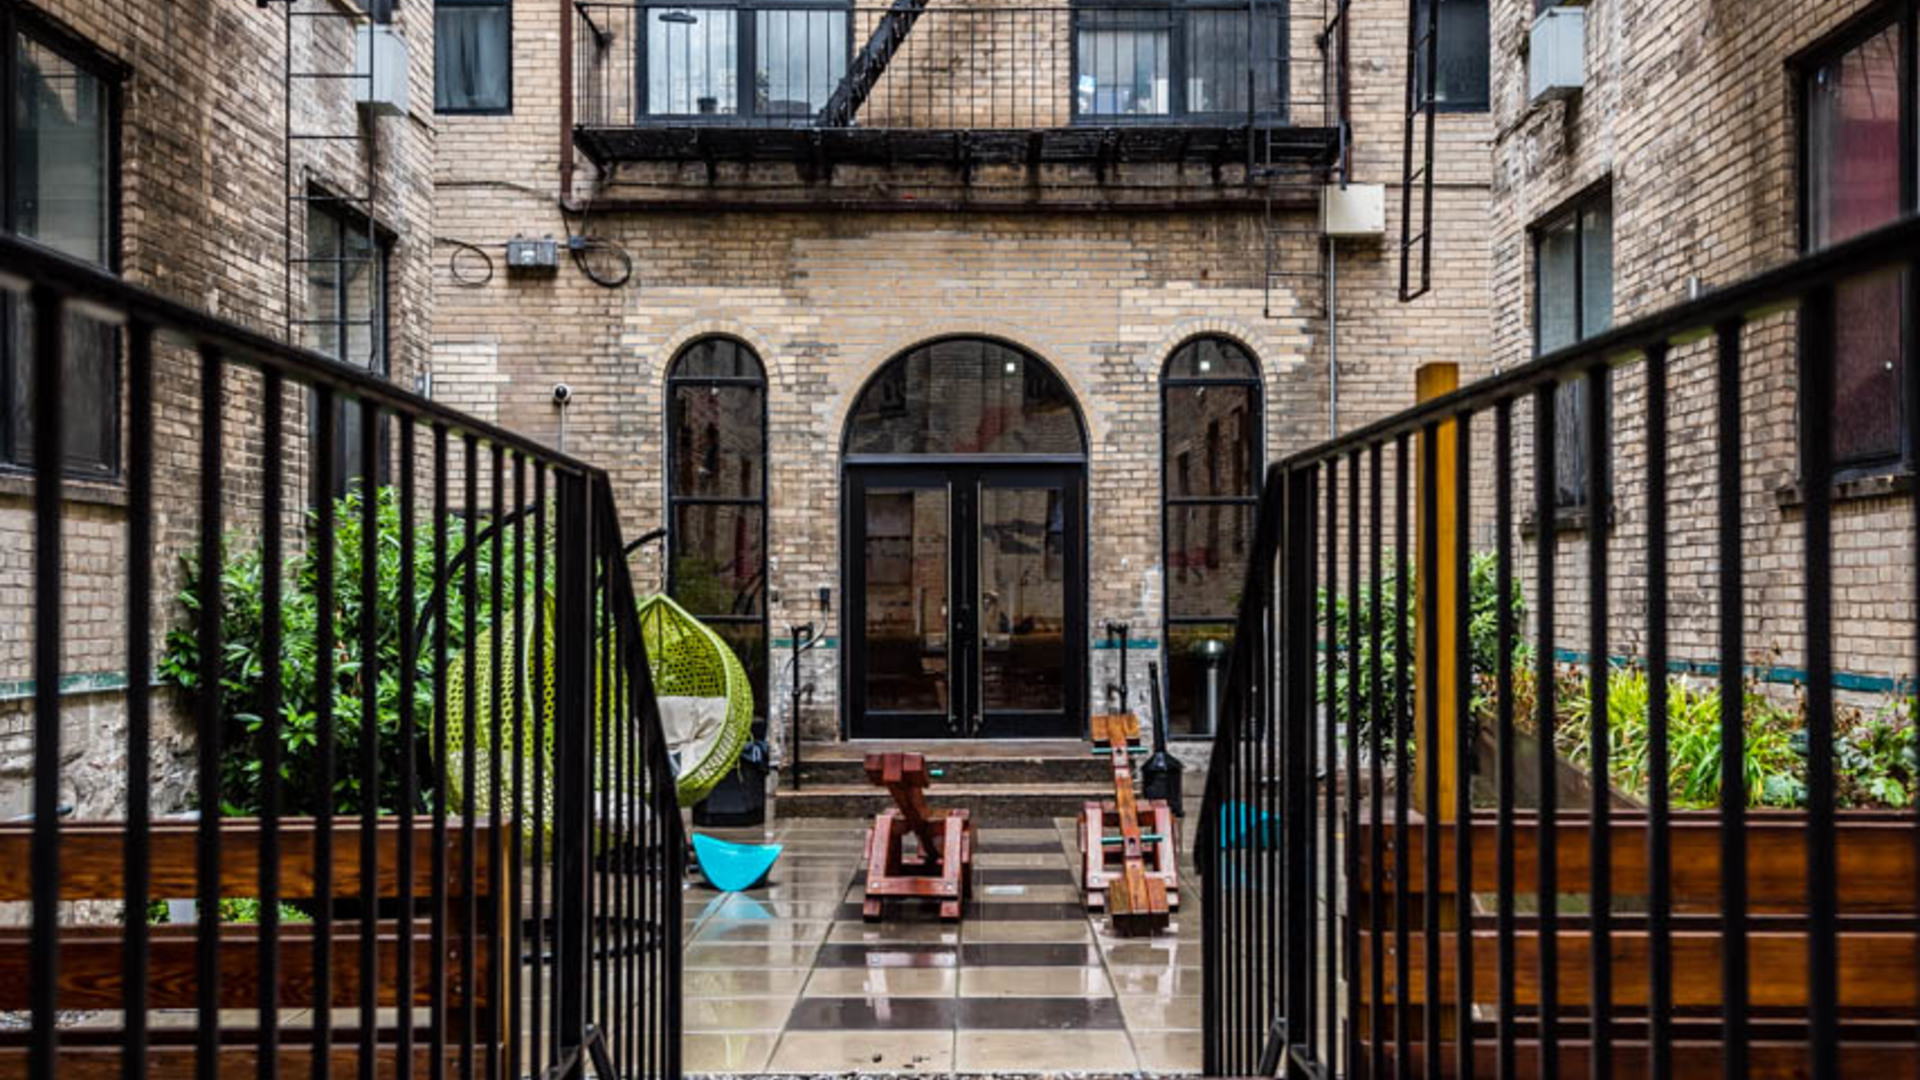 014 1635 putnam avenue courtyard 5